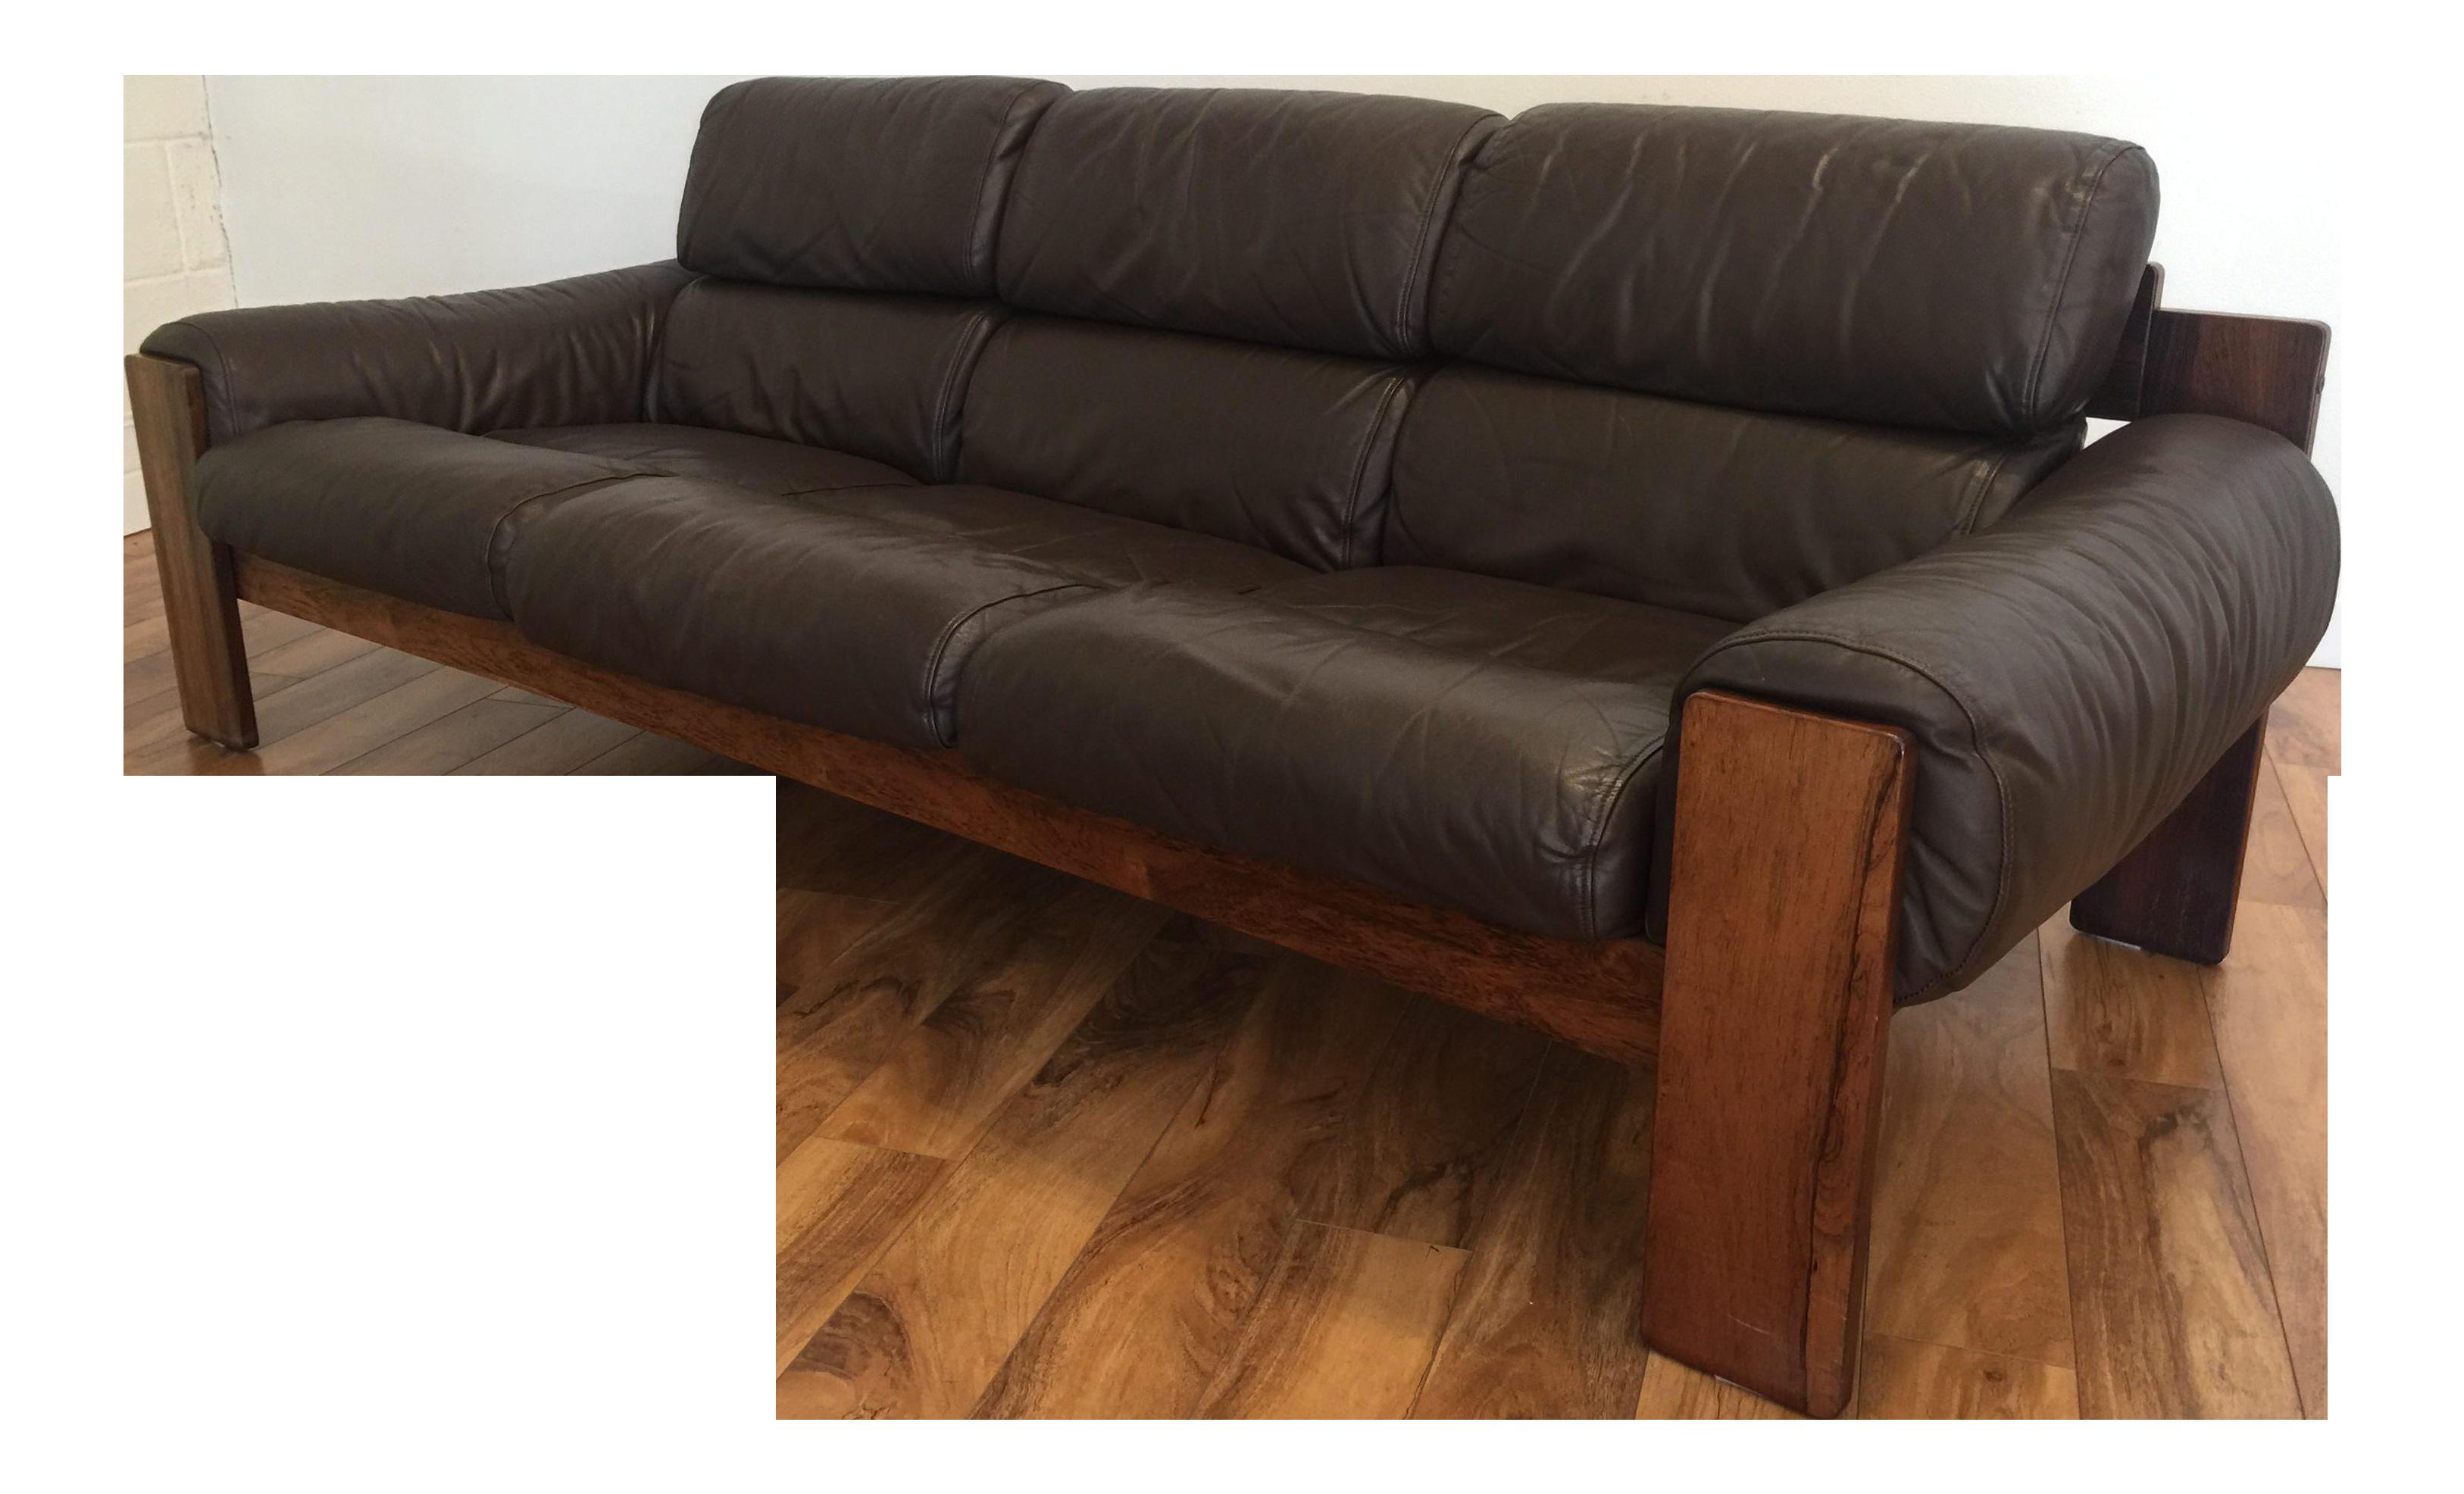 Late 1960s Uu Vee Kaluste Oy Of Finland Mid Century Modern  ~ Leather Mid Century Modern Sofa